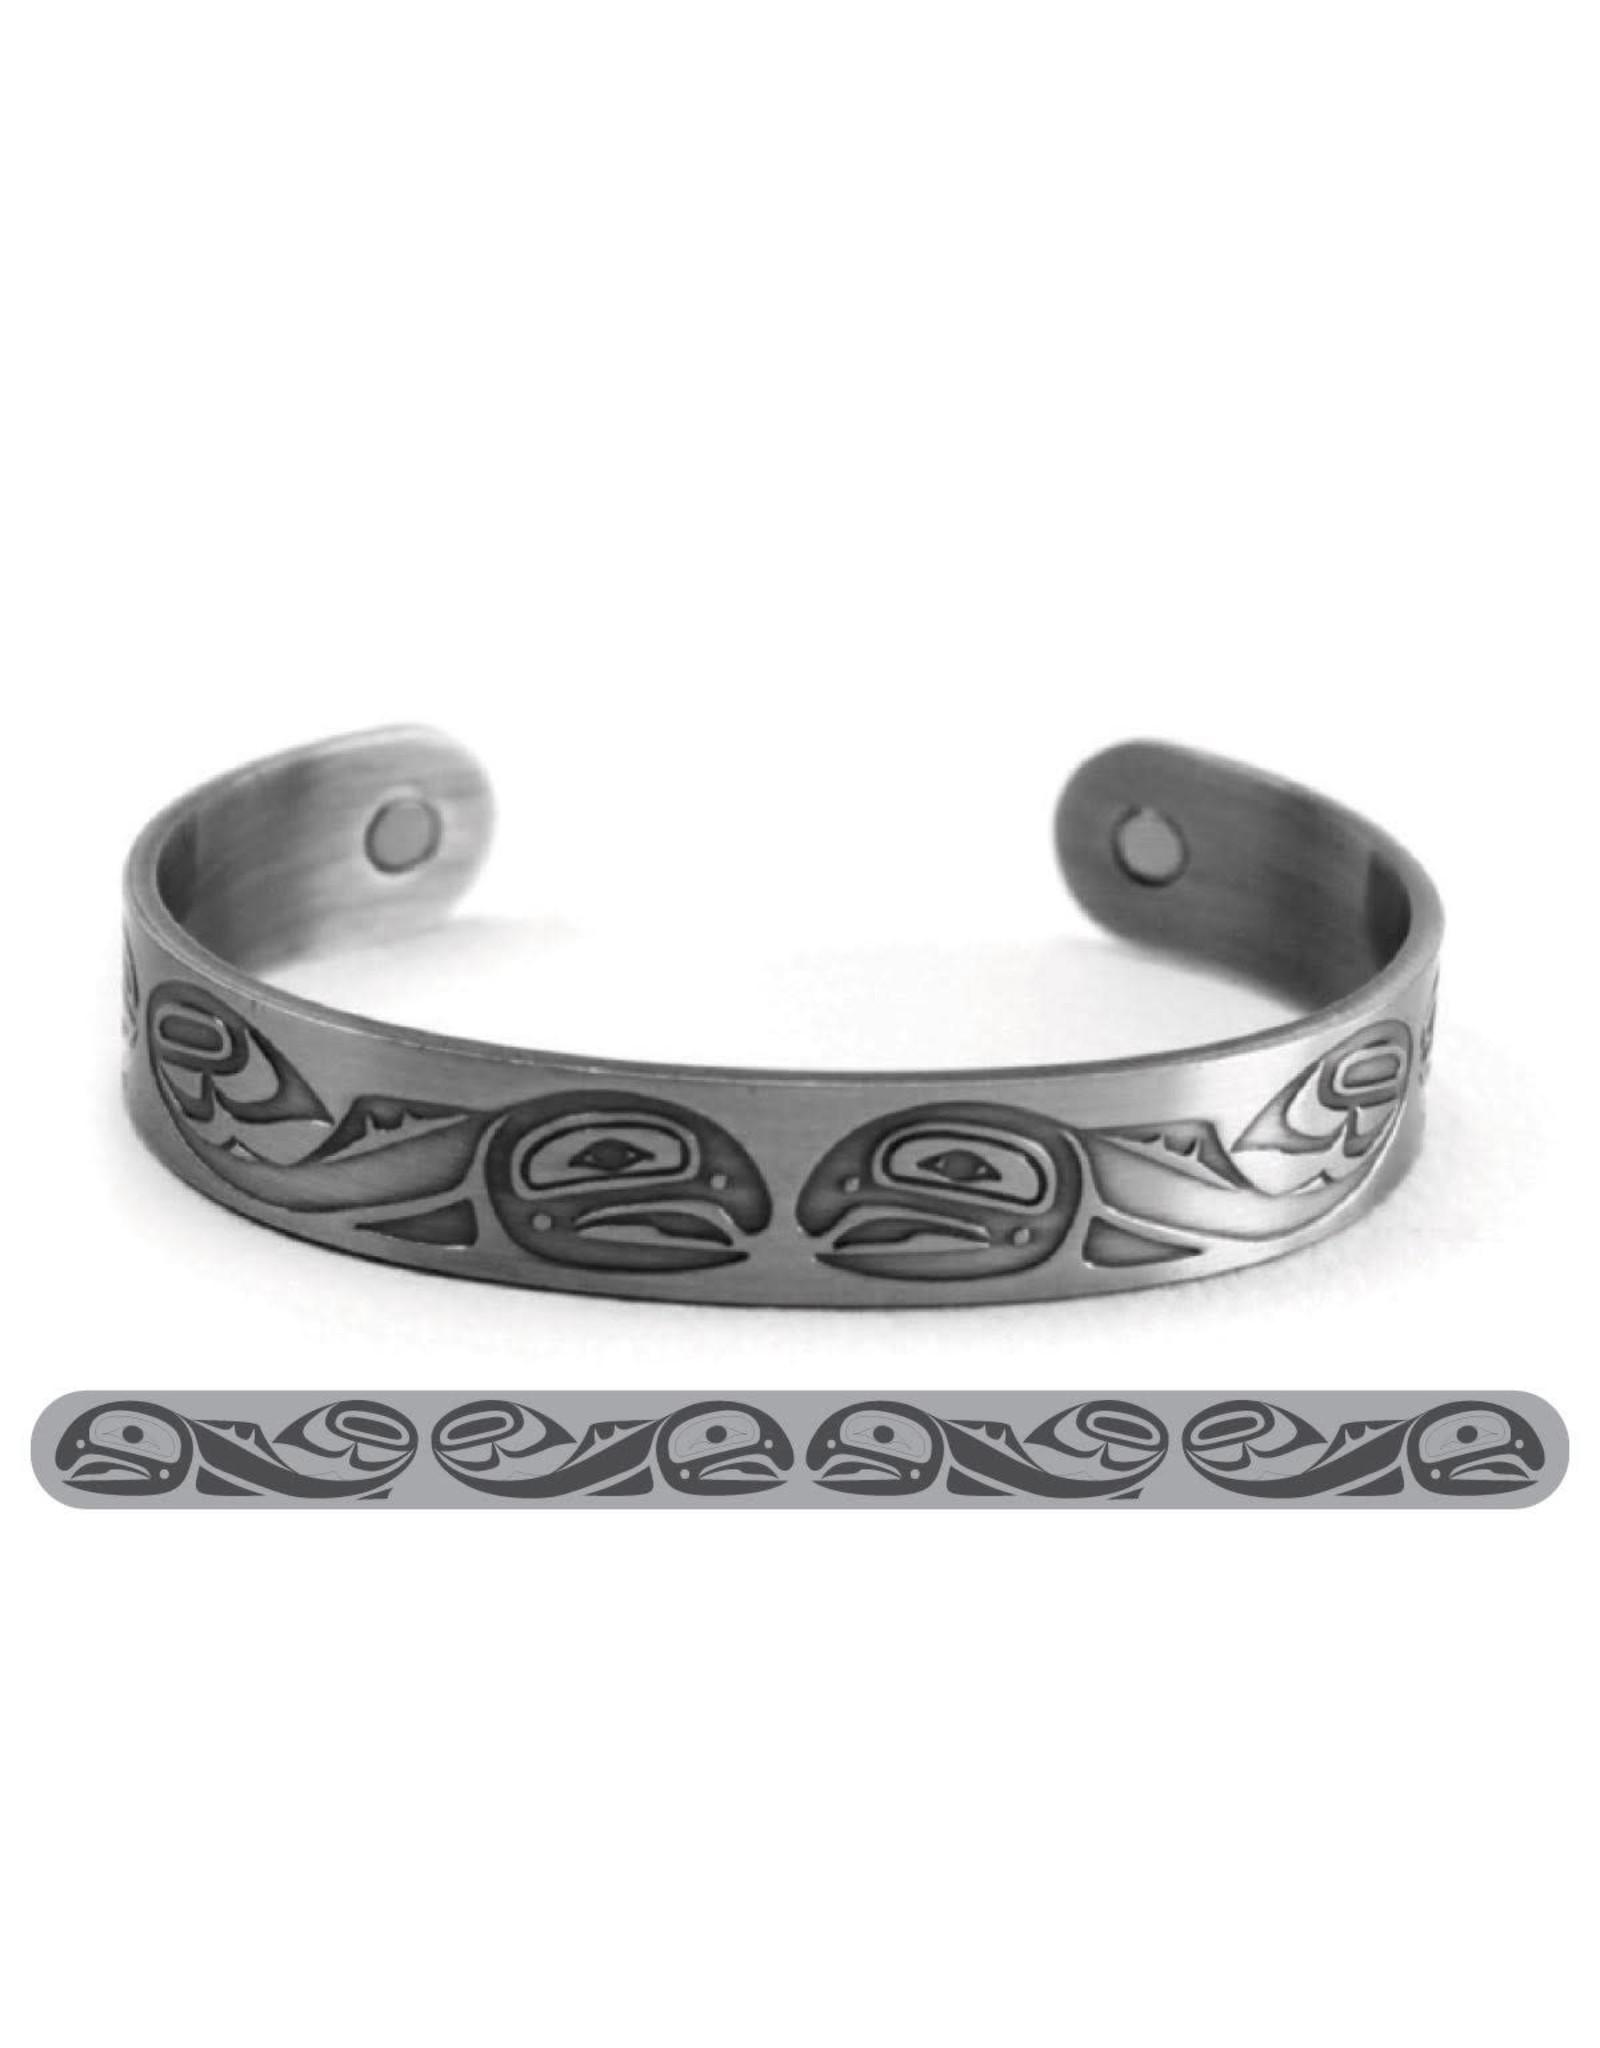 Haida Cuffs Brushed Silver Salmon by Paul Windsor - ABR11